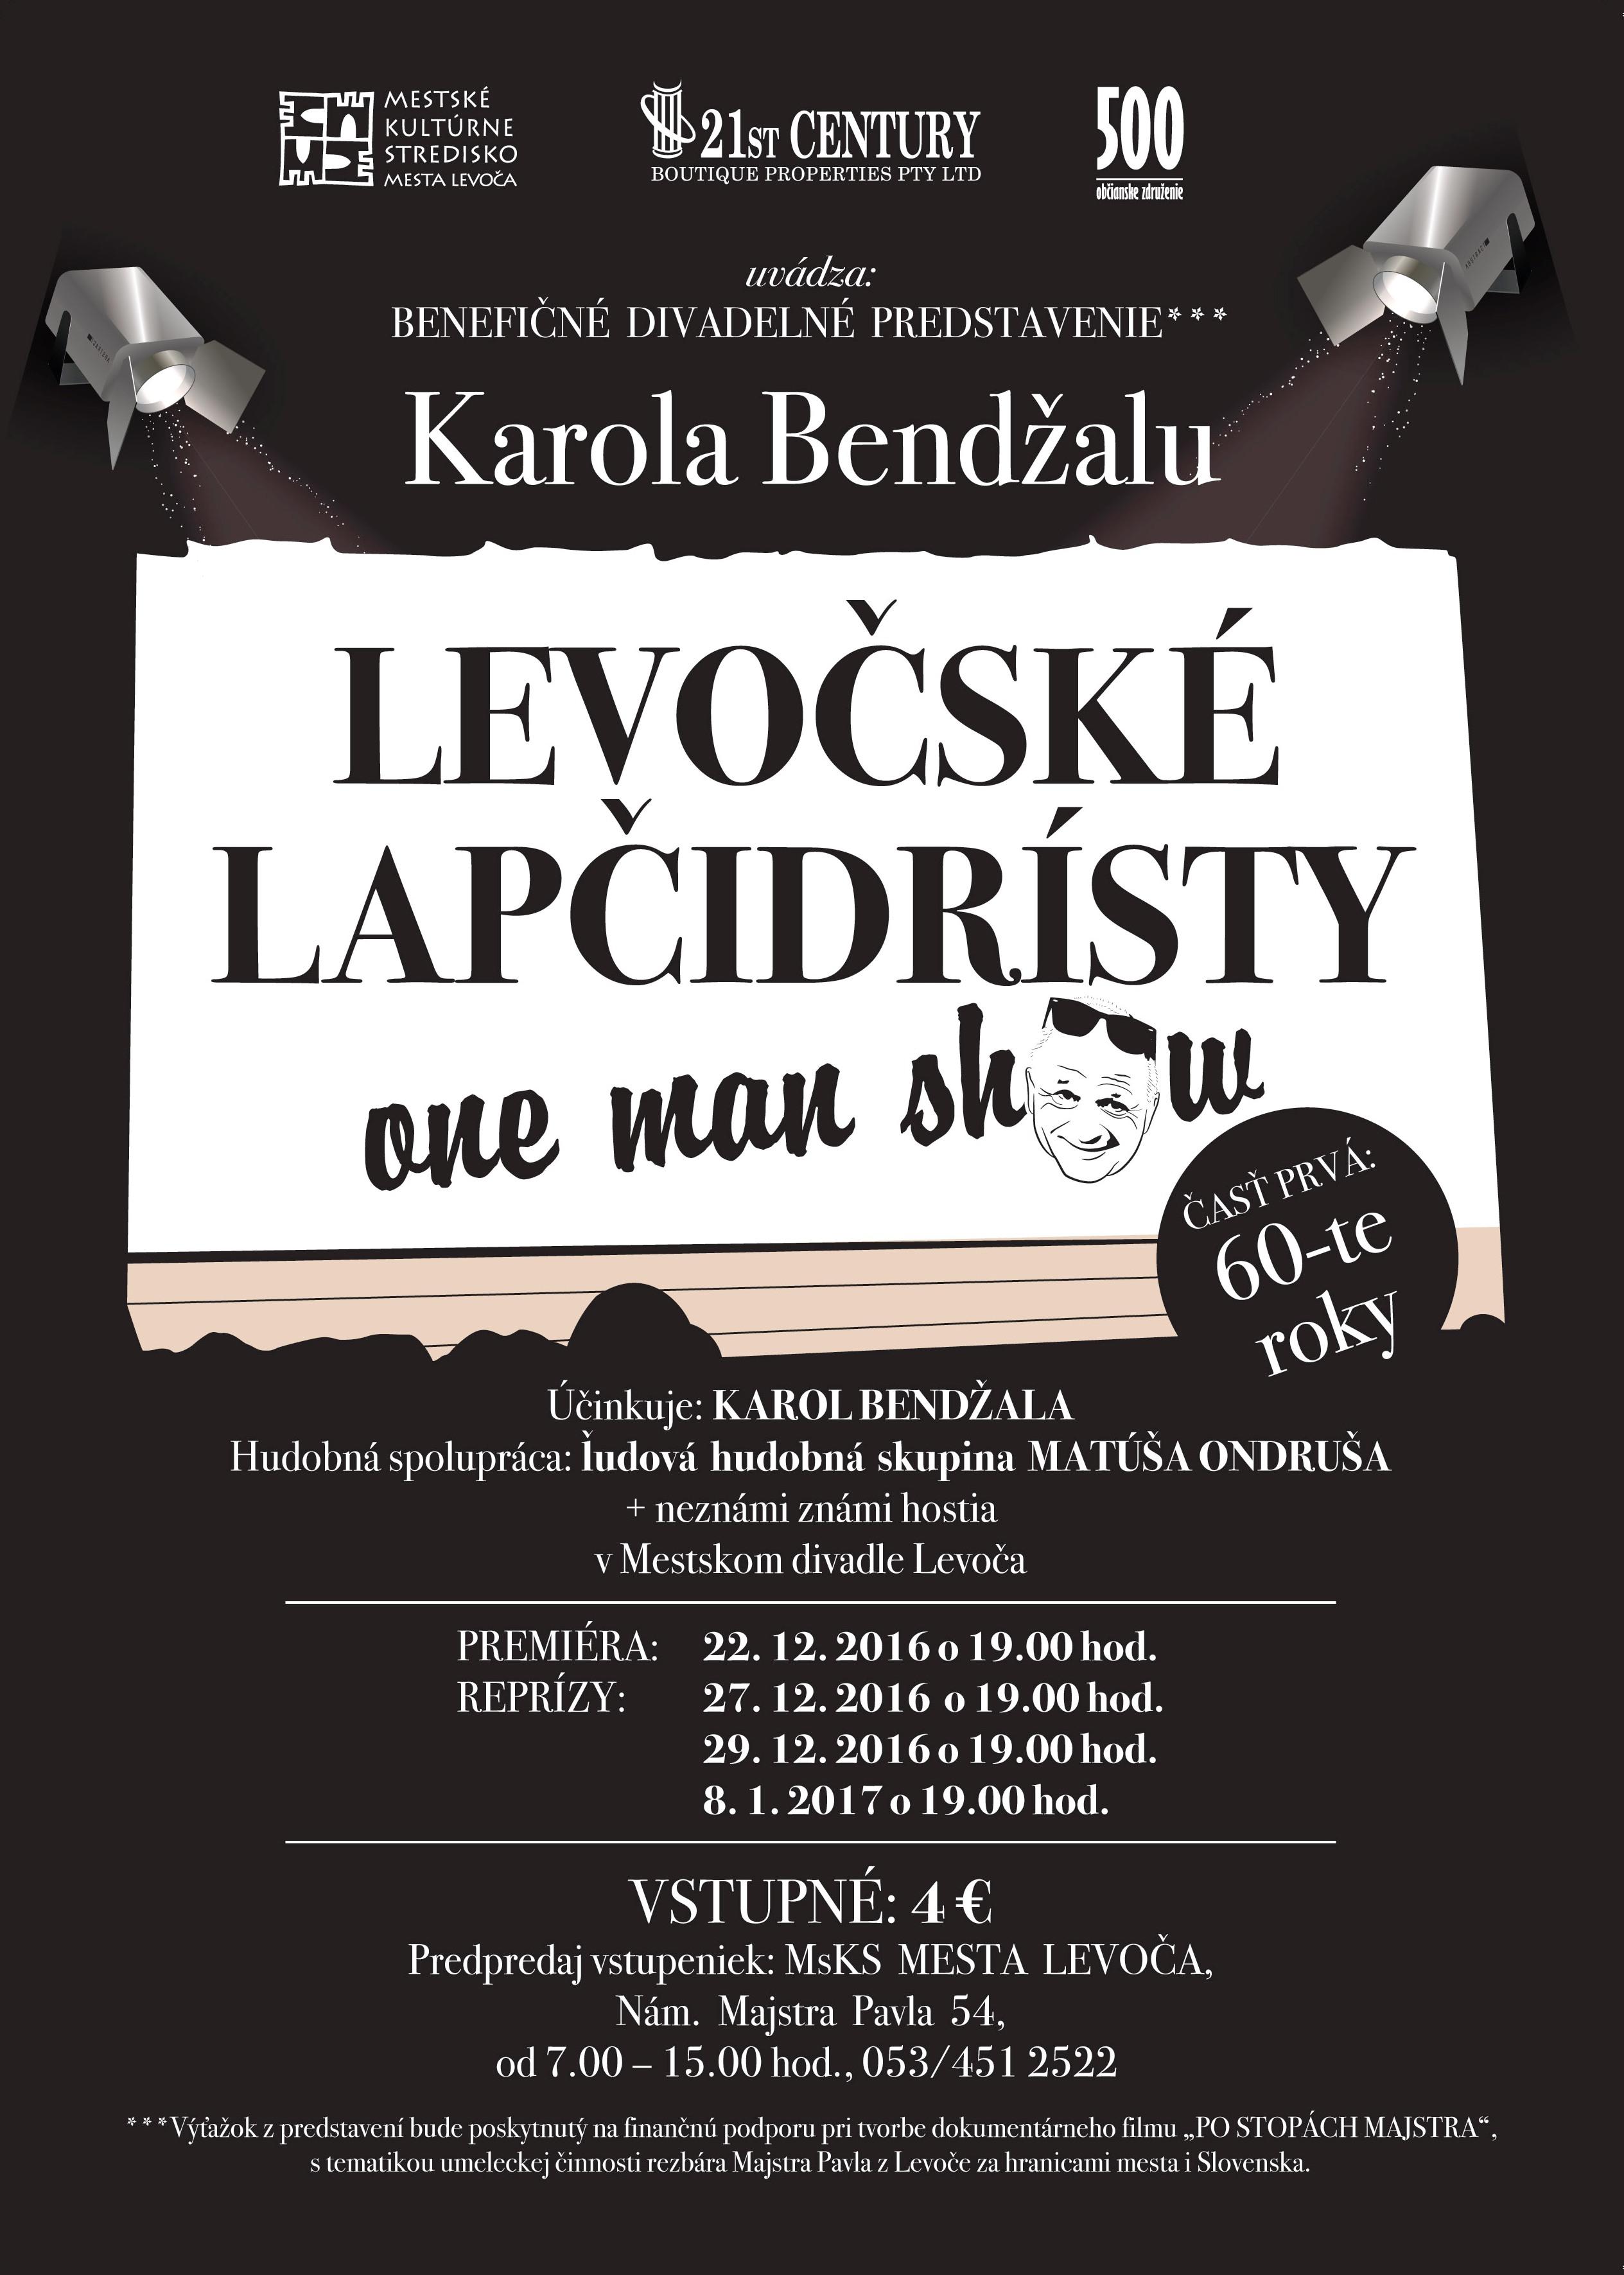 levocske_lapcidristy_jpg_a4